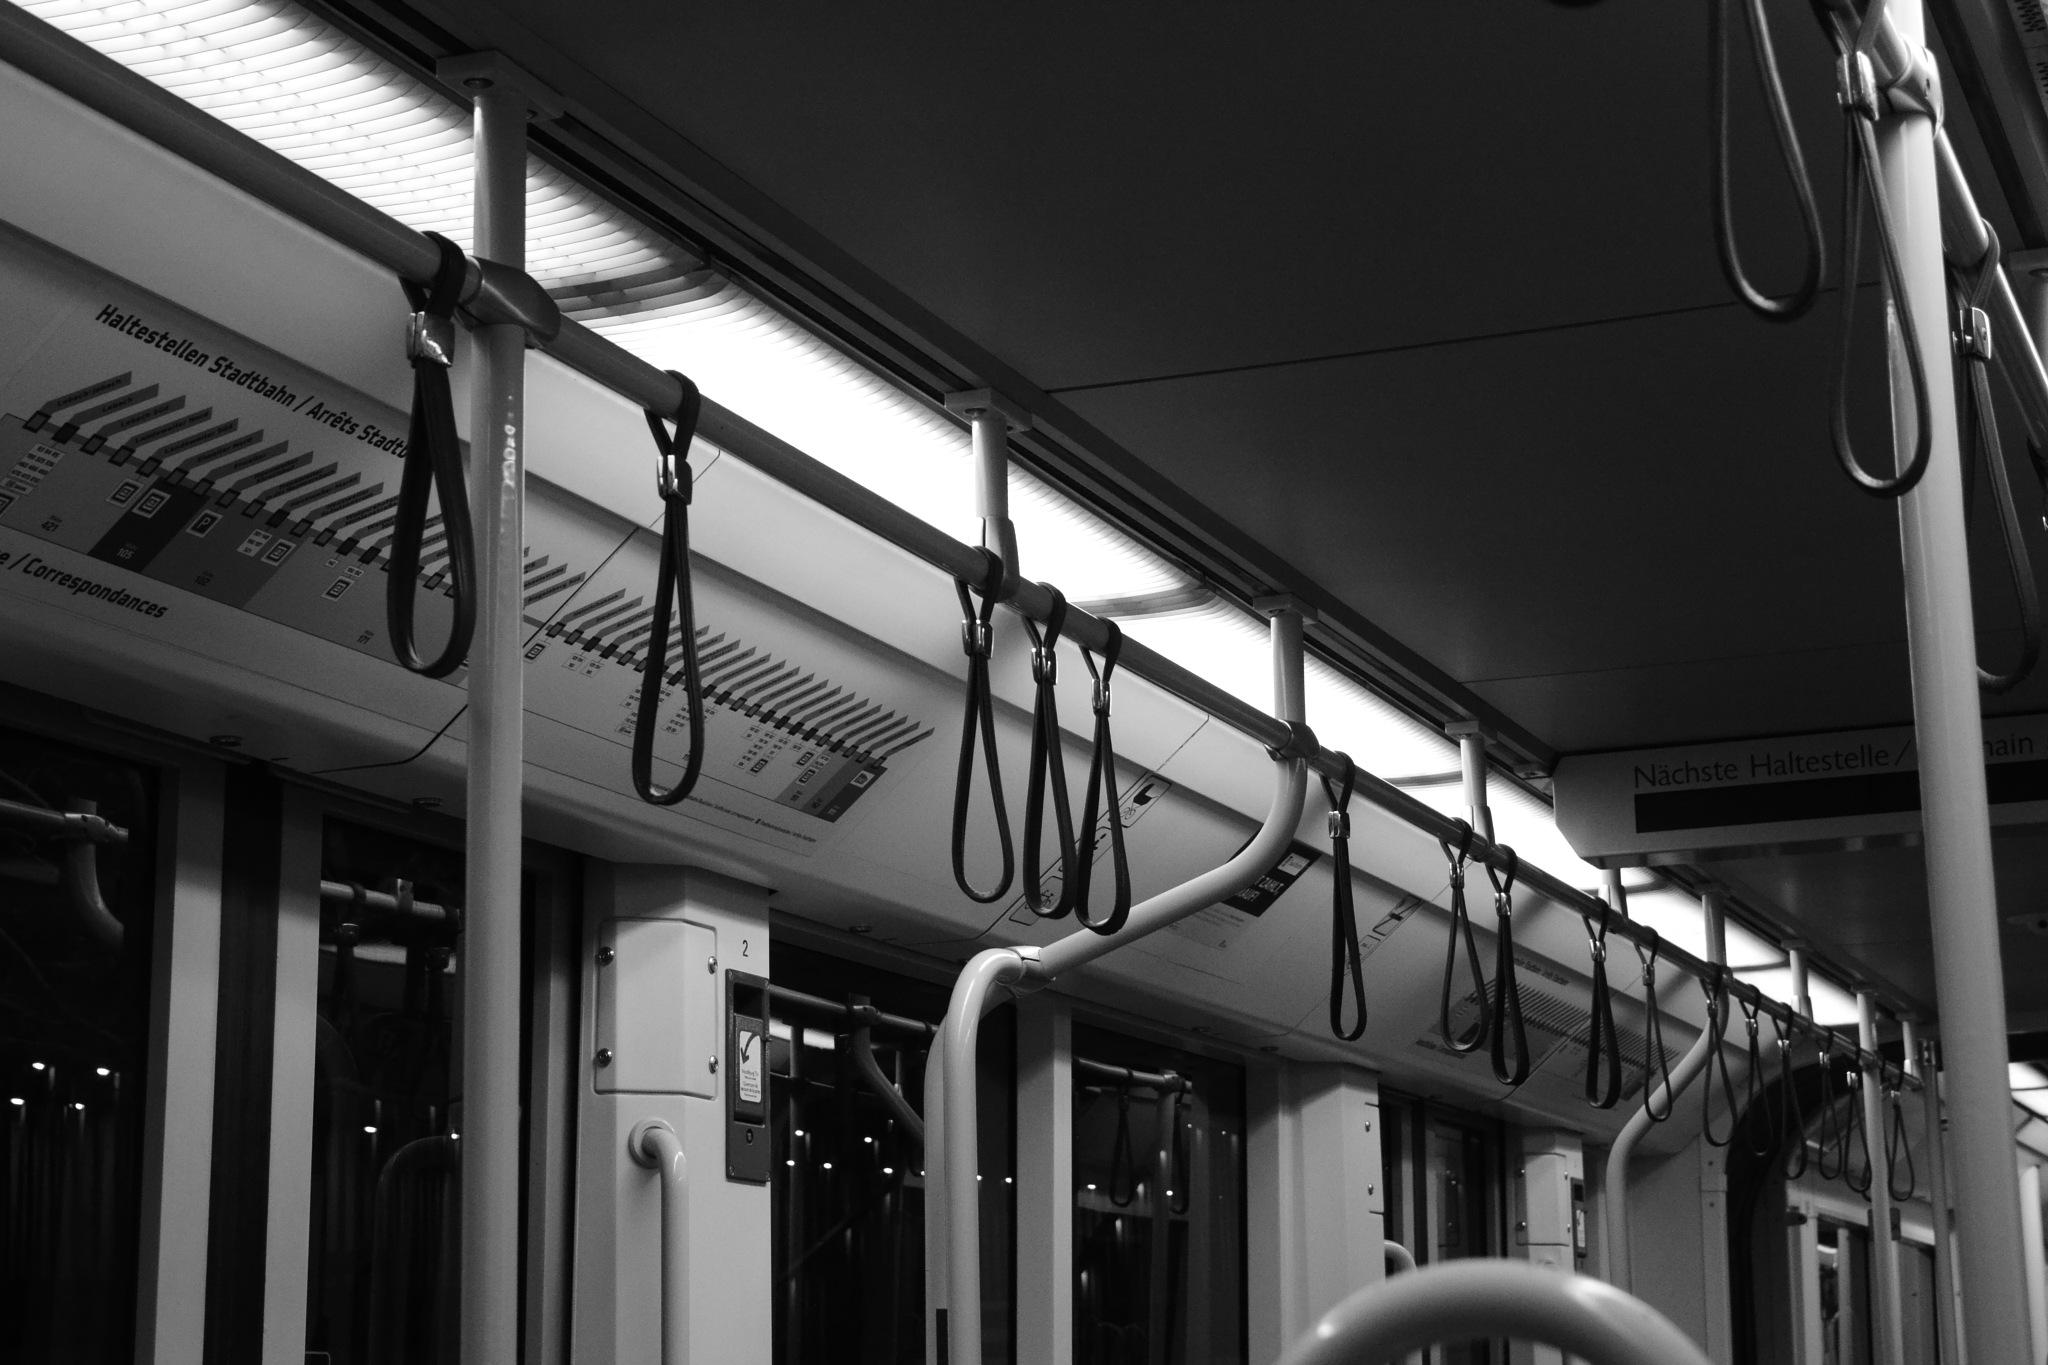 modern gallows. by June Bug